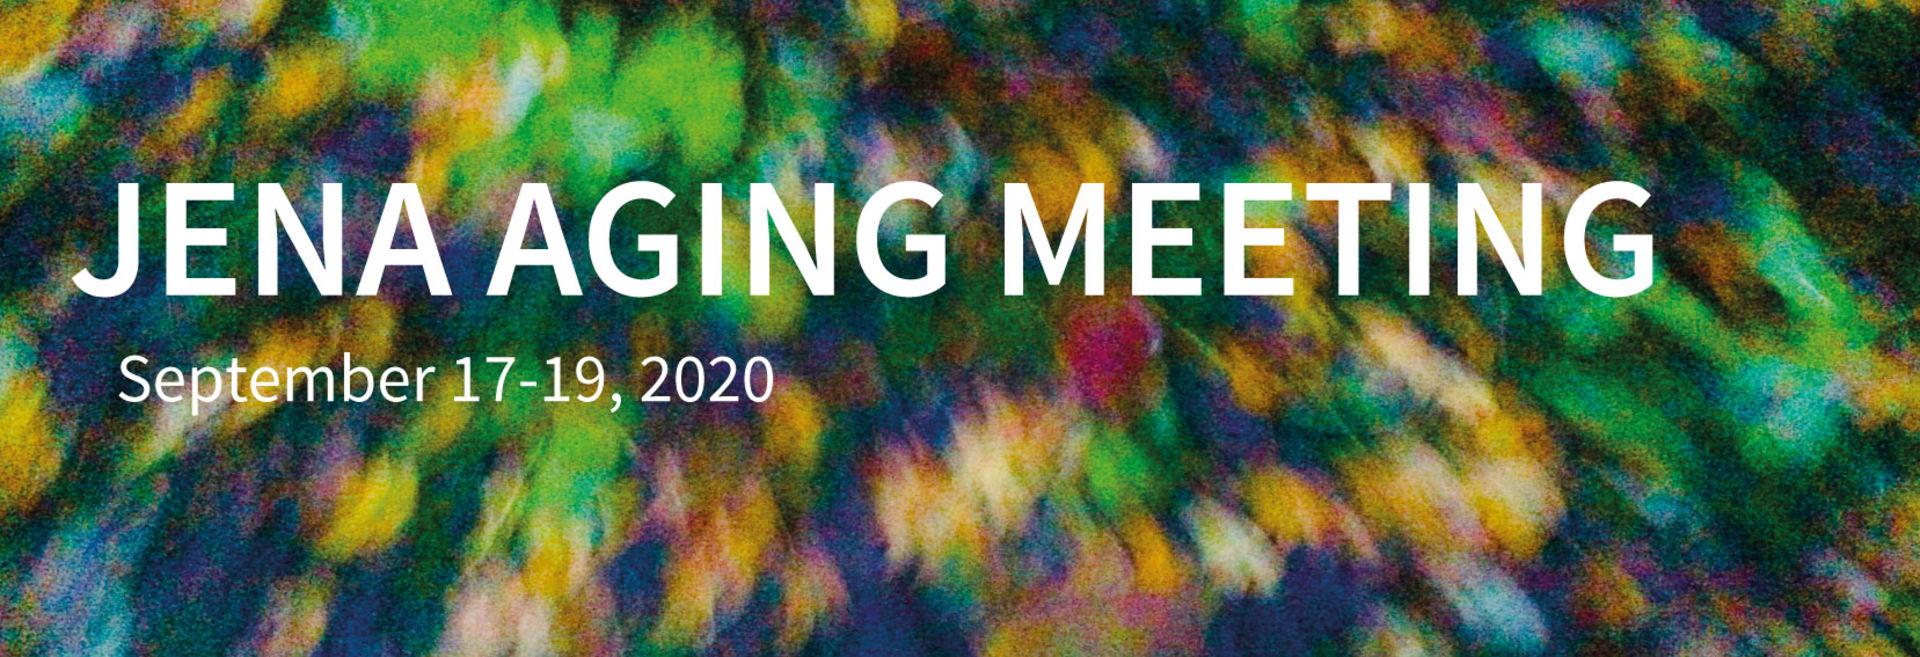 Jena Aging Meeting 2020